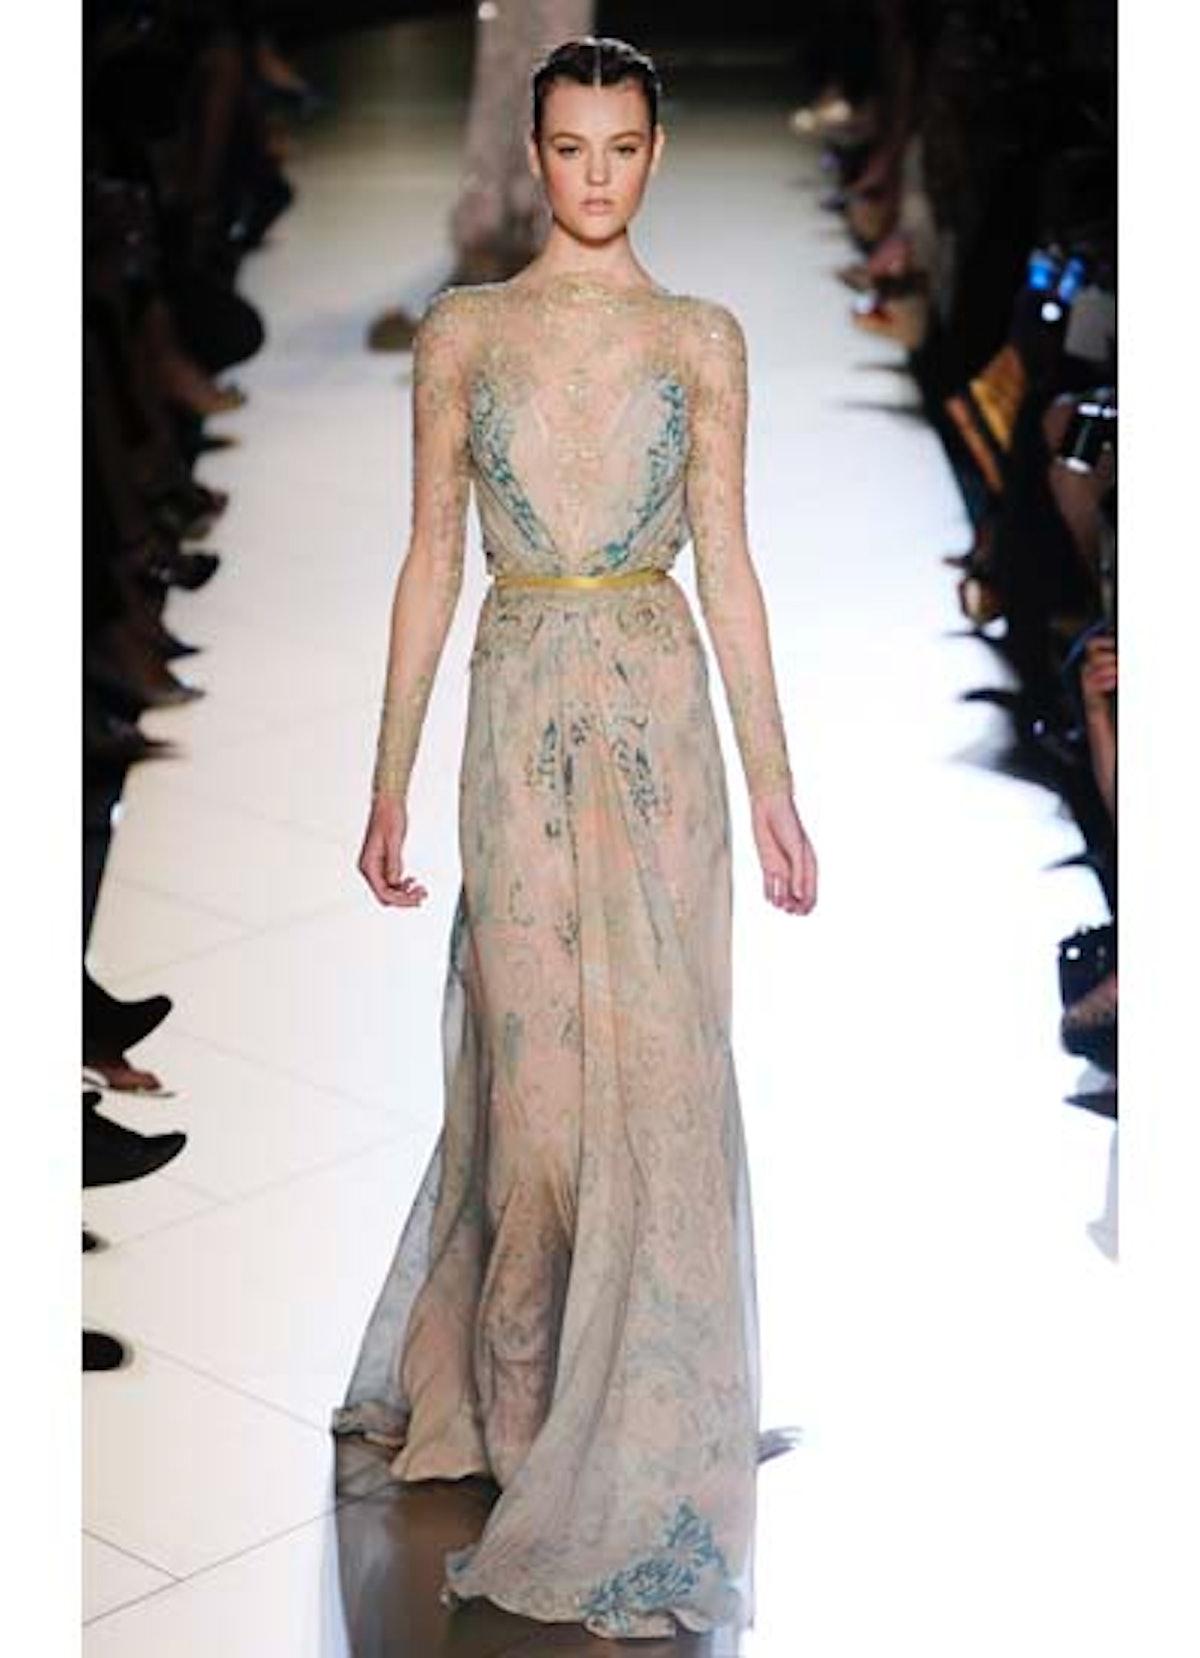 fass-elie-saab-couture-2012-runway-32-v.jpg